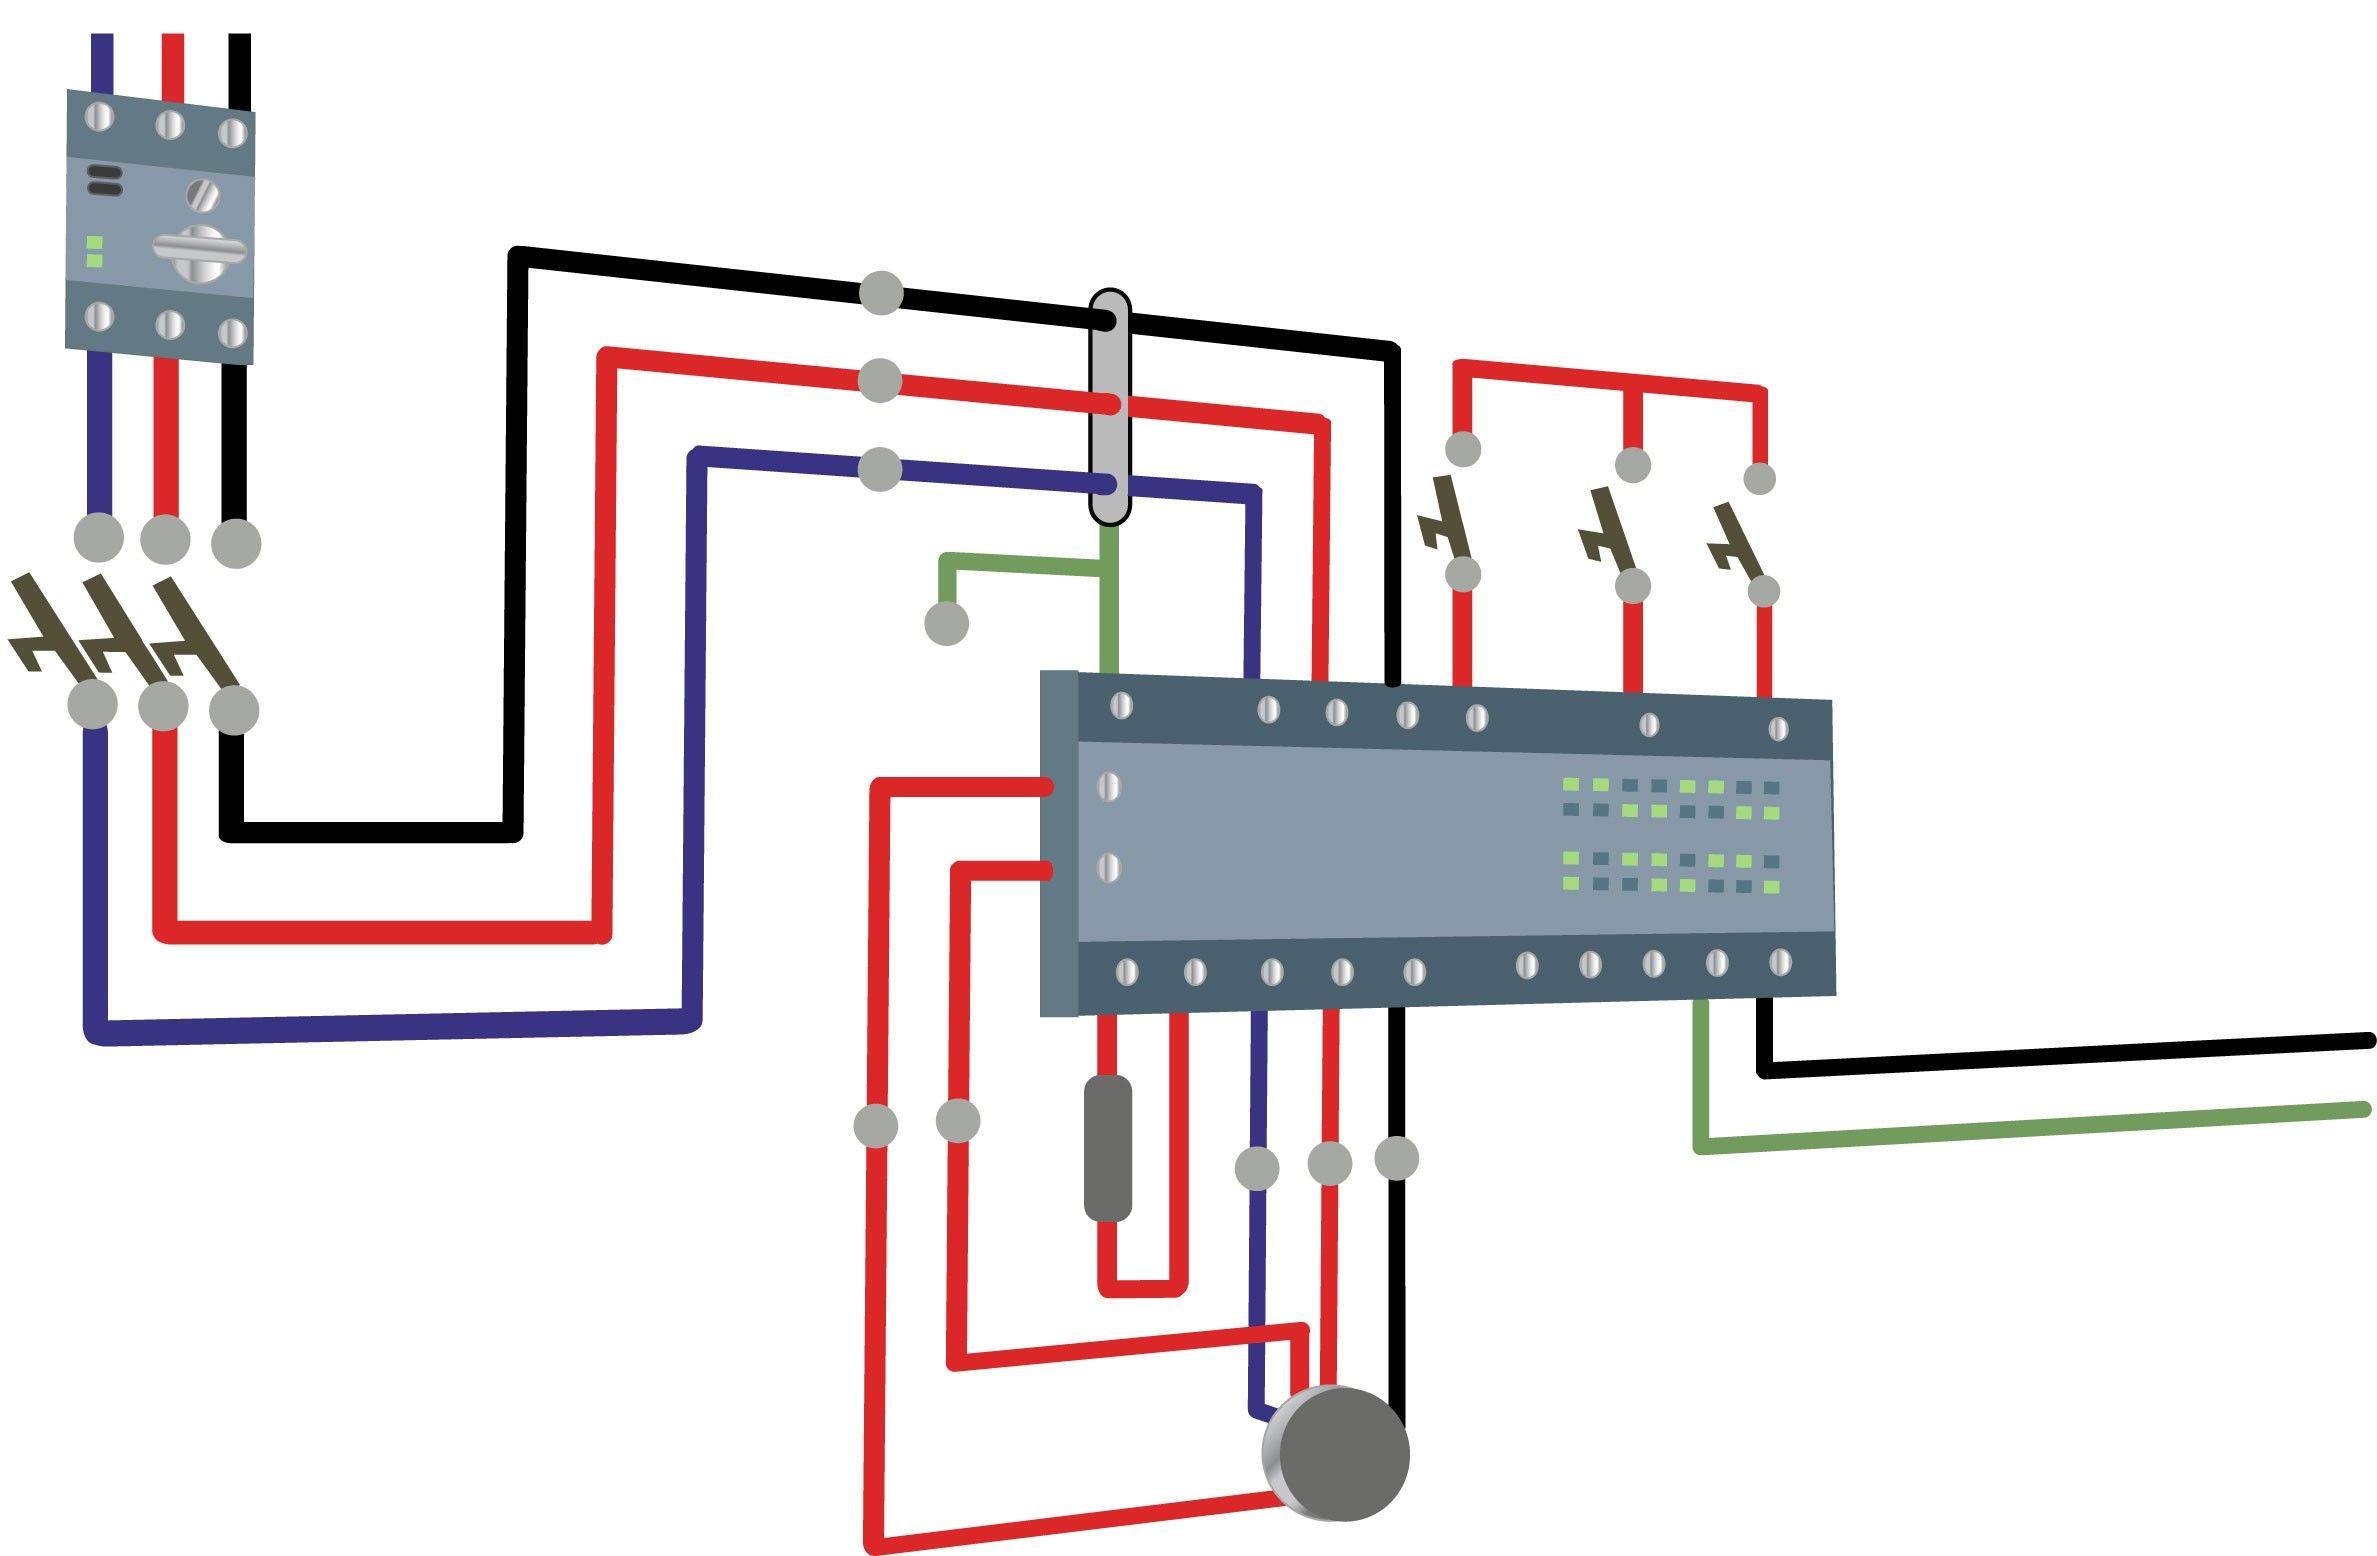 Pin on Wiring Diagram SamplePinterest